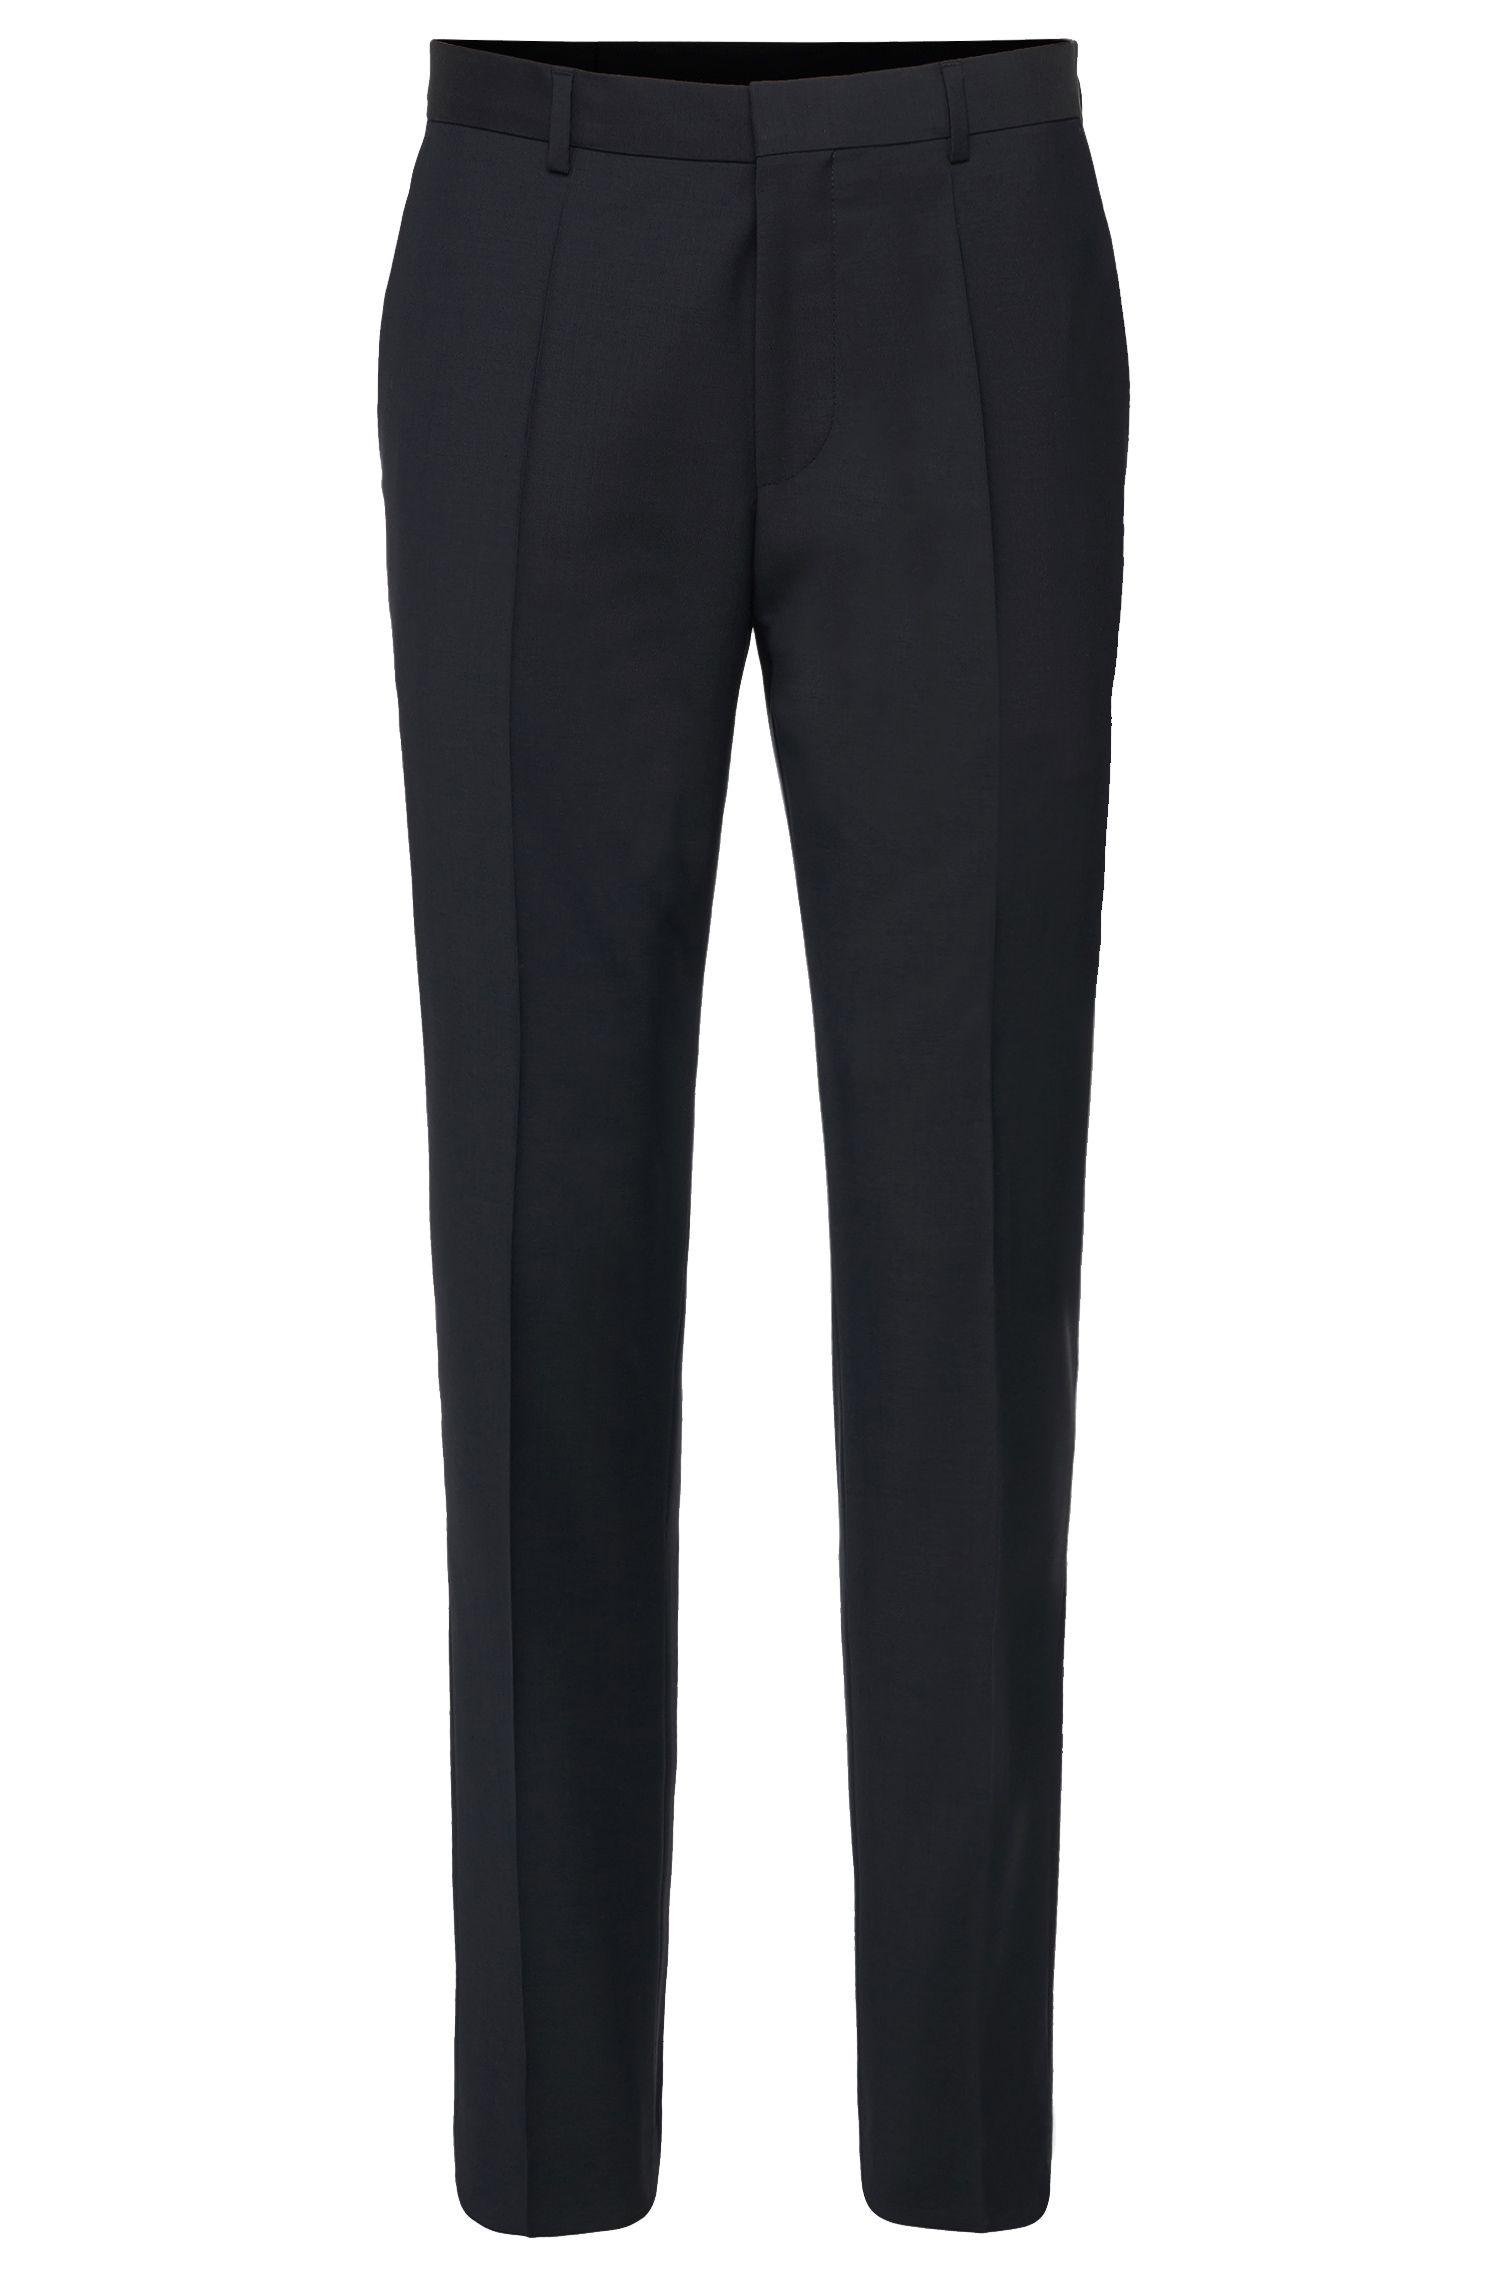 Unifarbene Slim-Fit Hose aus Schurwolle: 'HardyS'